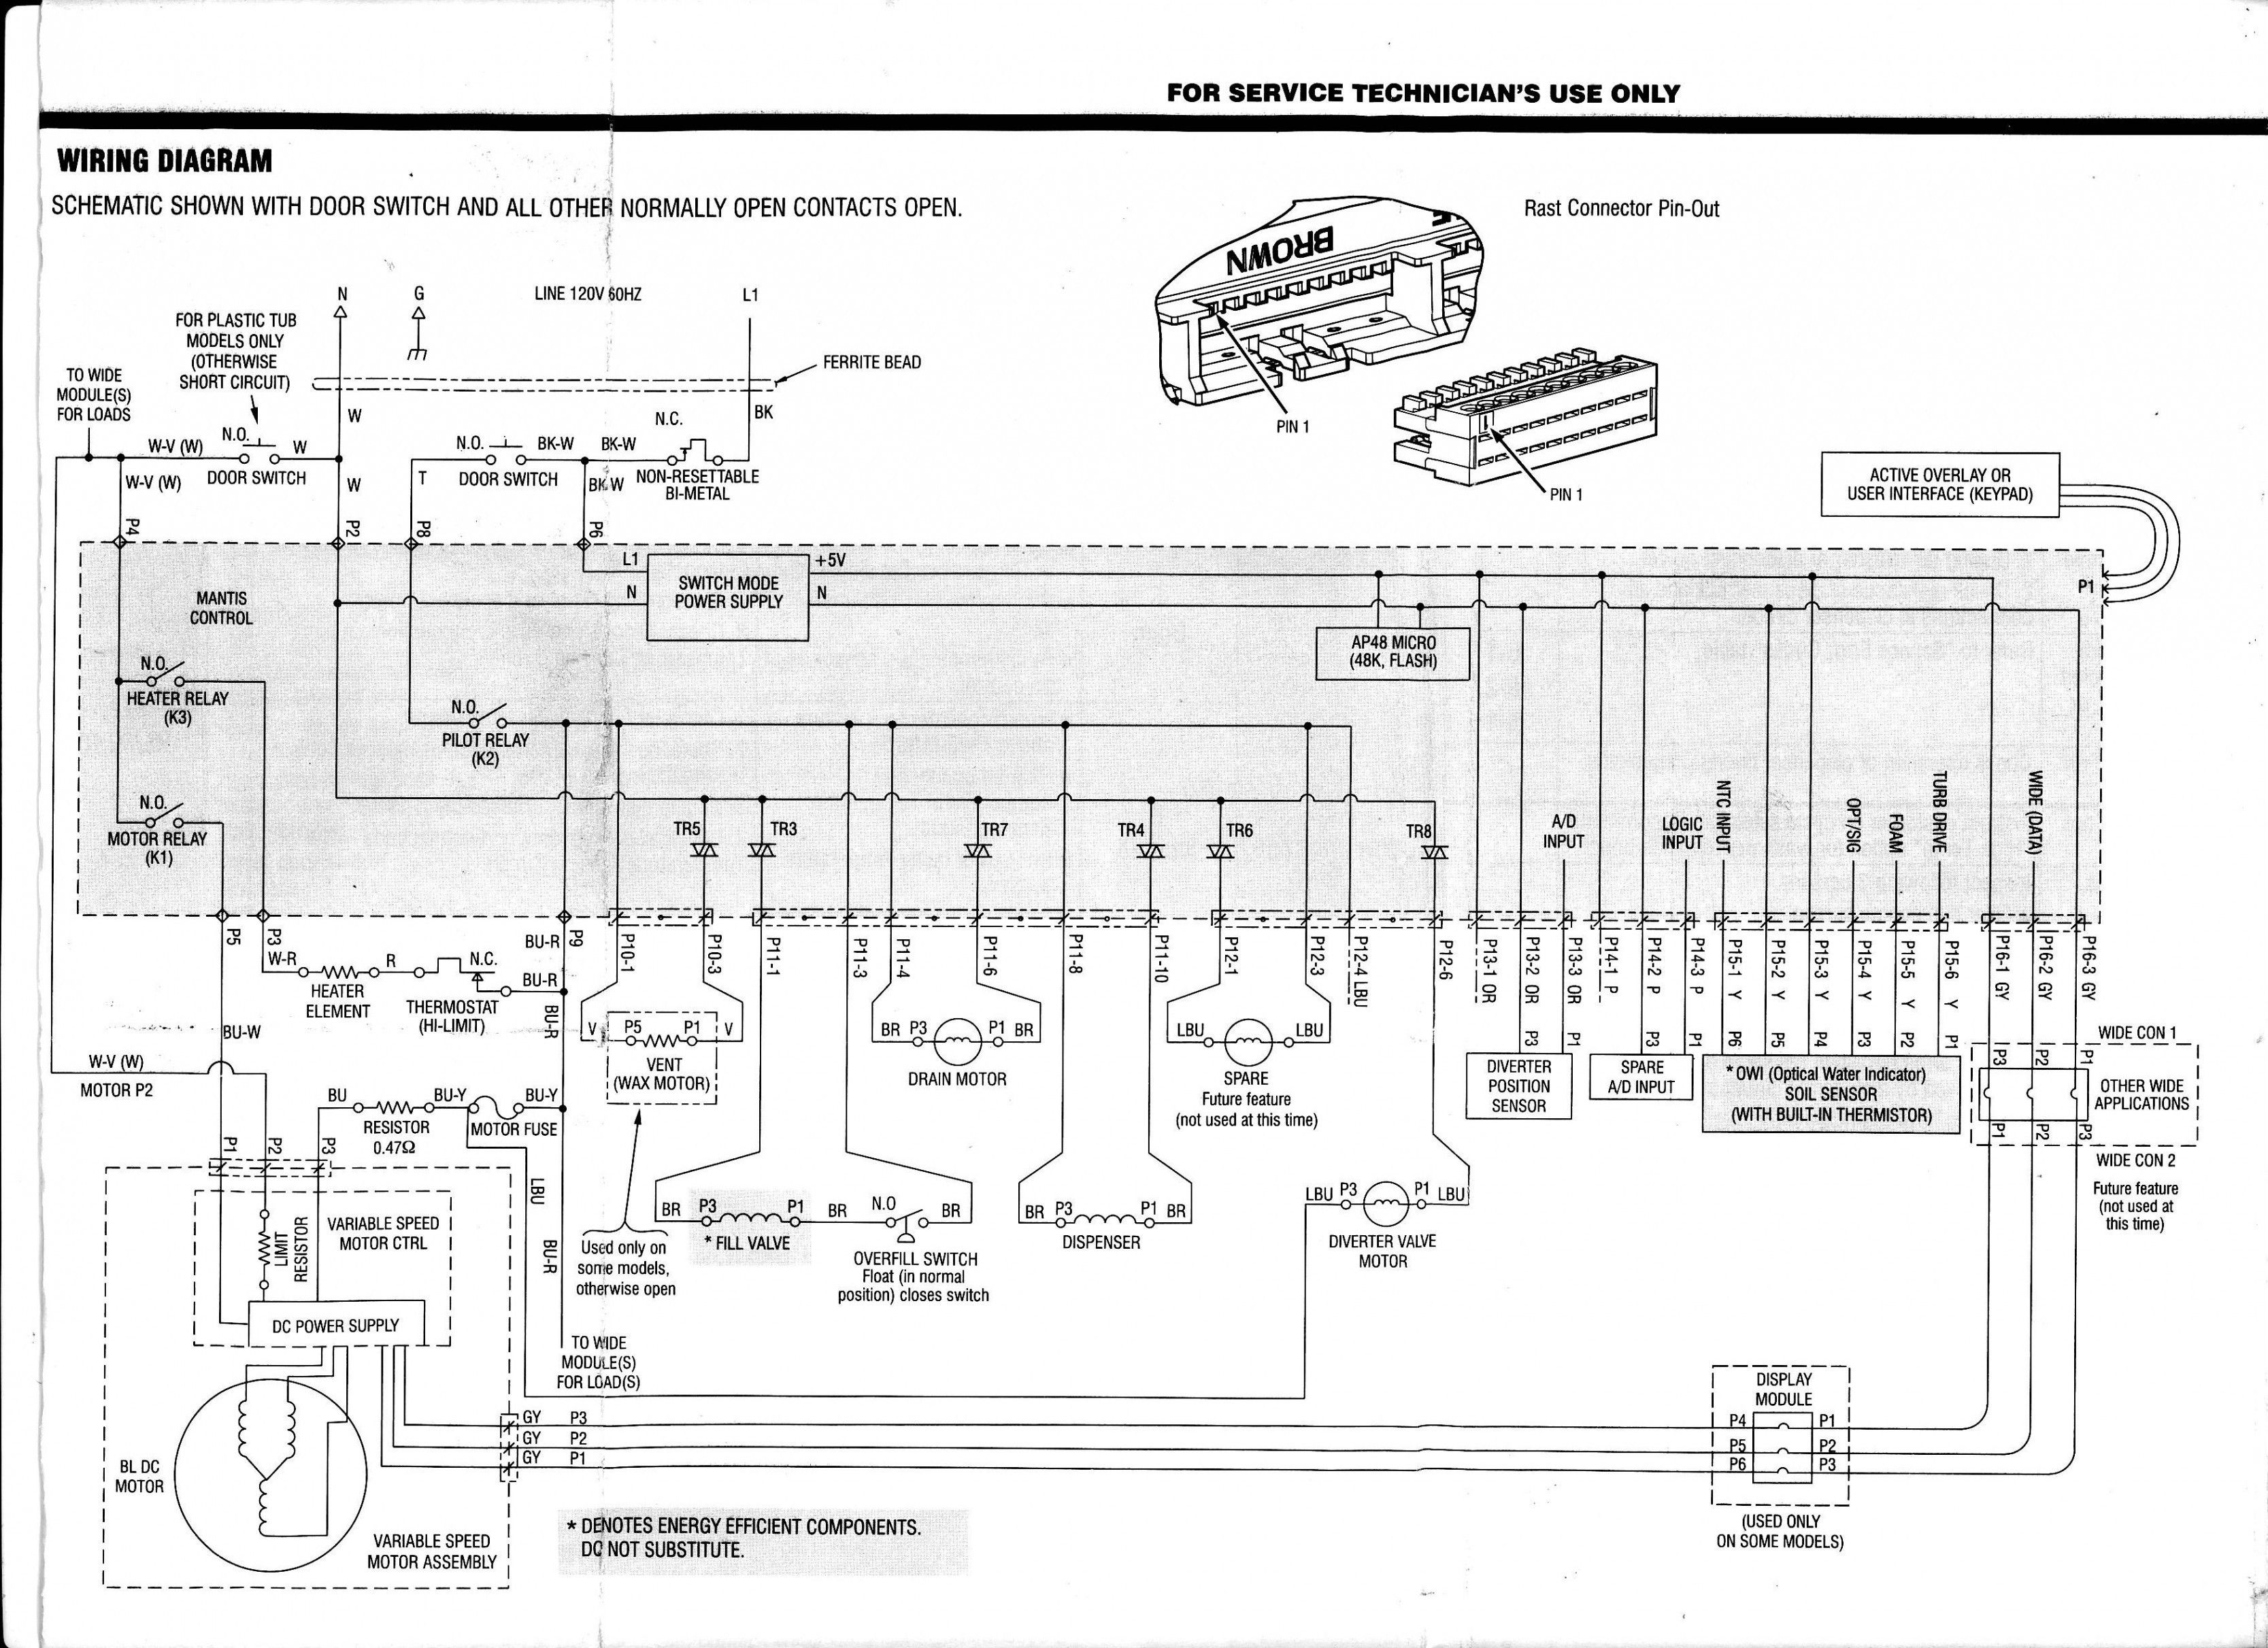 diagram] 1990 club cart diagram - alla.infinityagespa.it  diagram